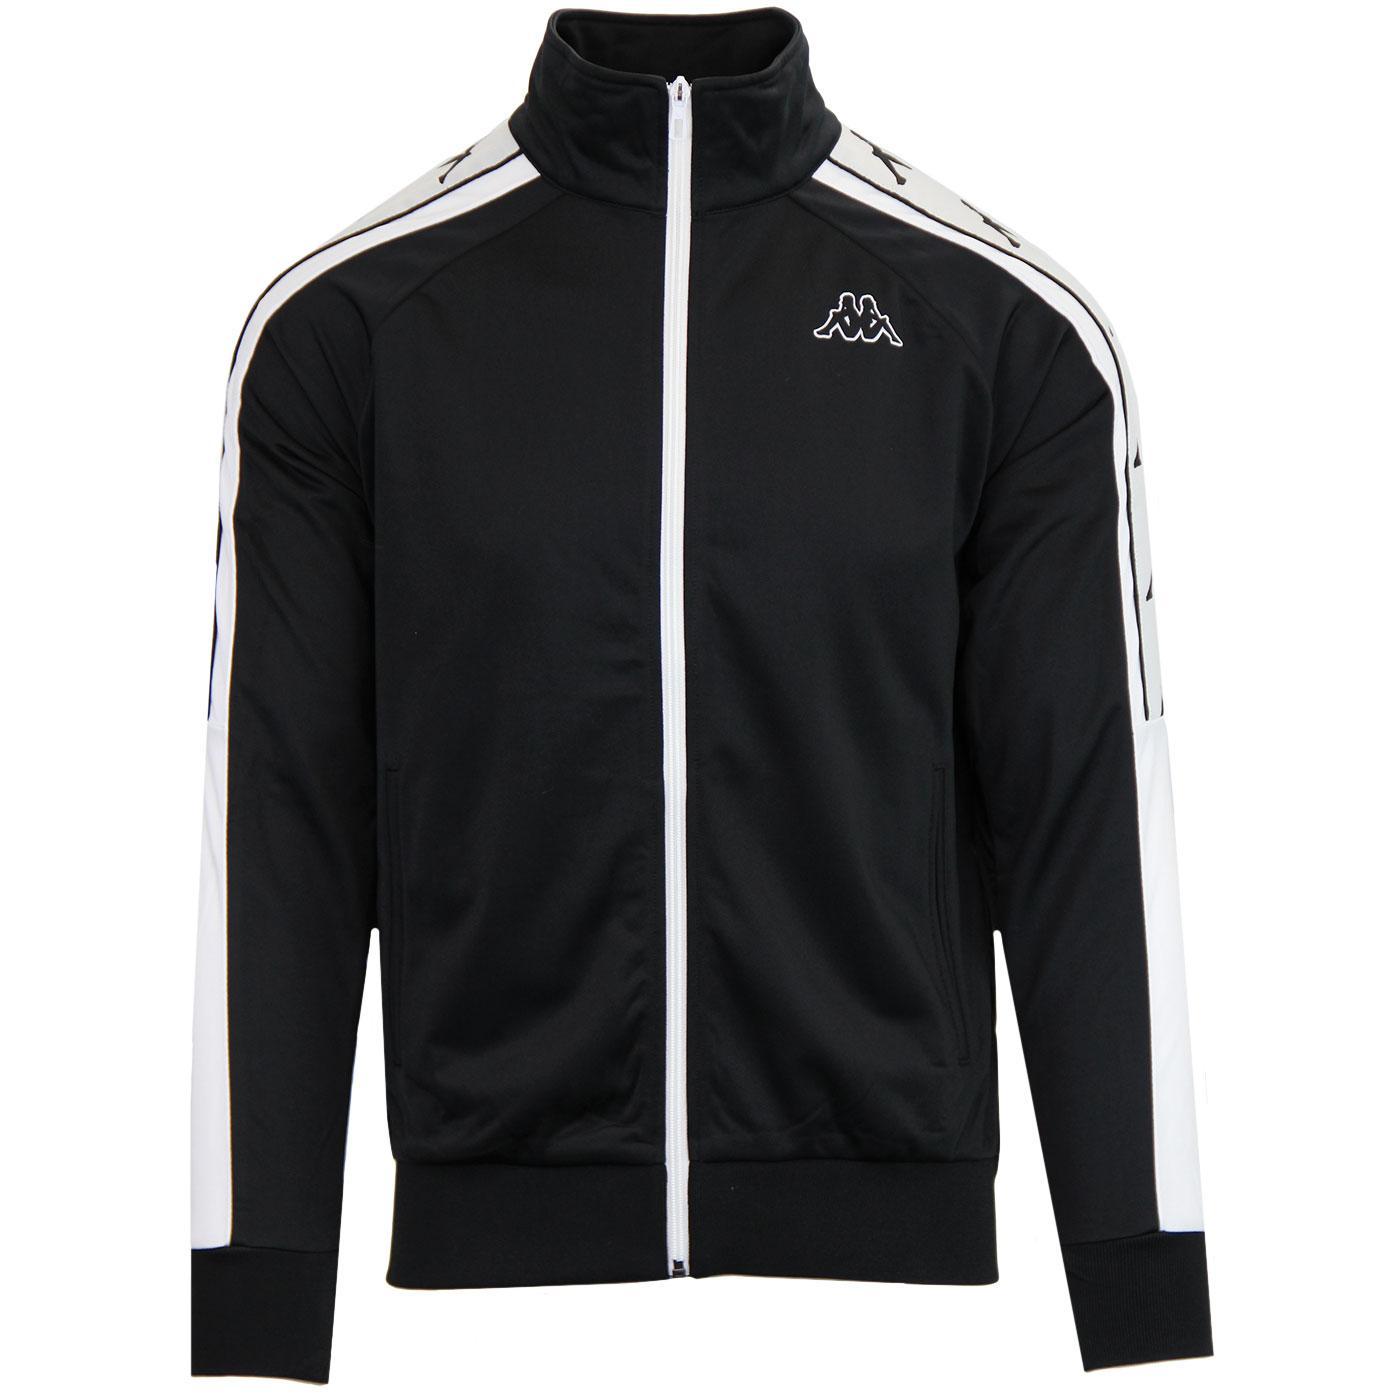 Banda Ahran KAPPA Retro Track Jacket (Black/White)